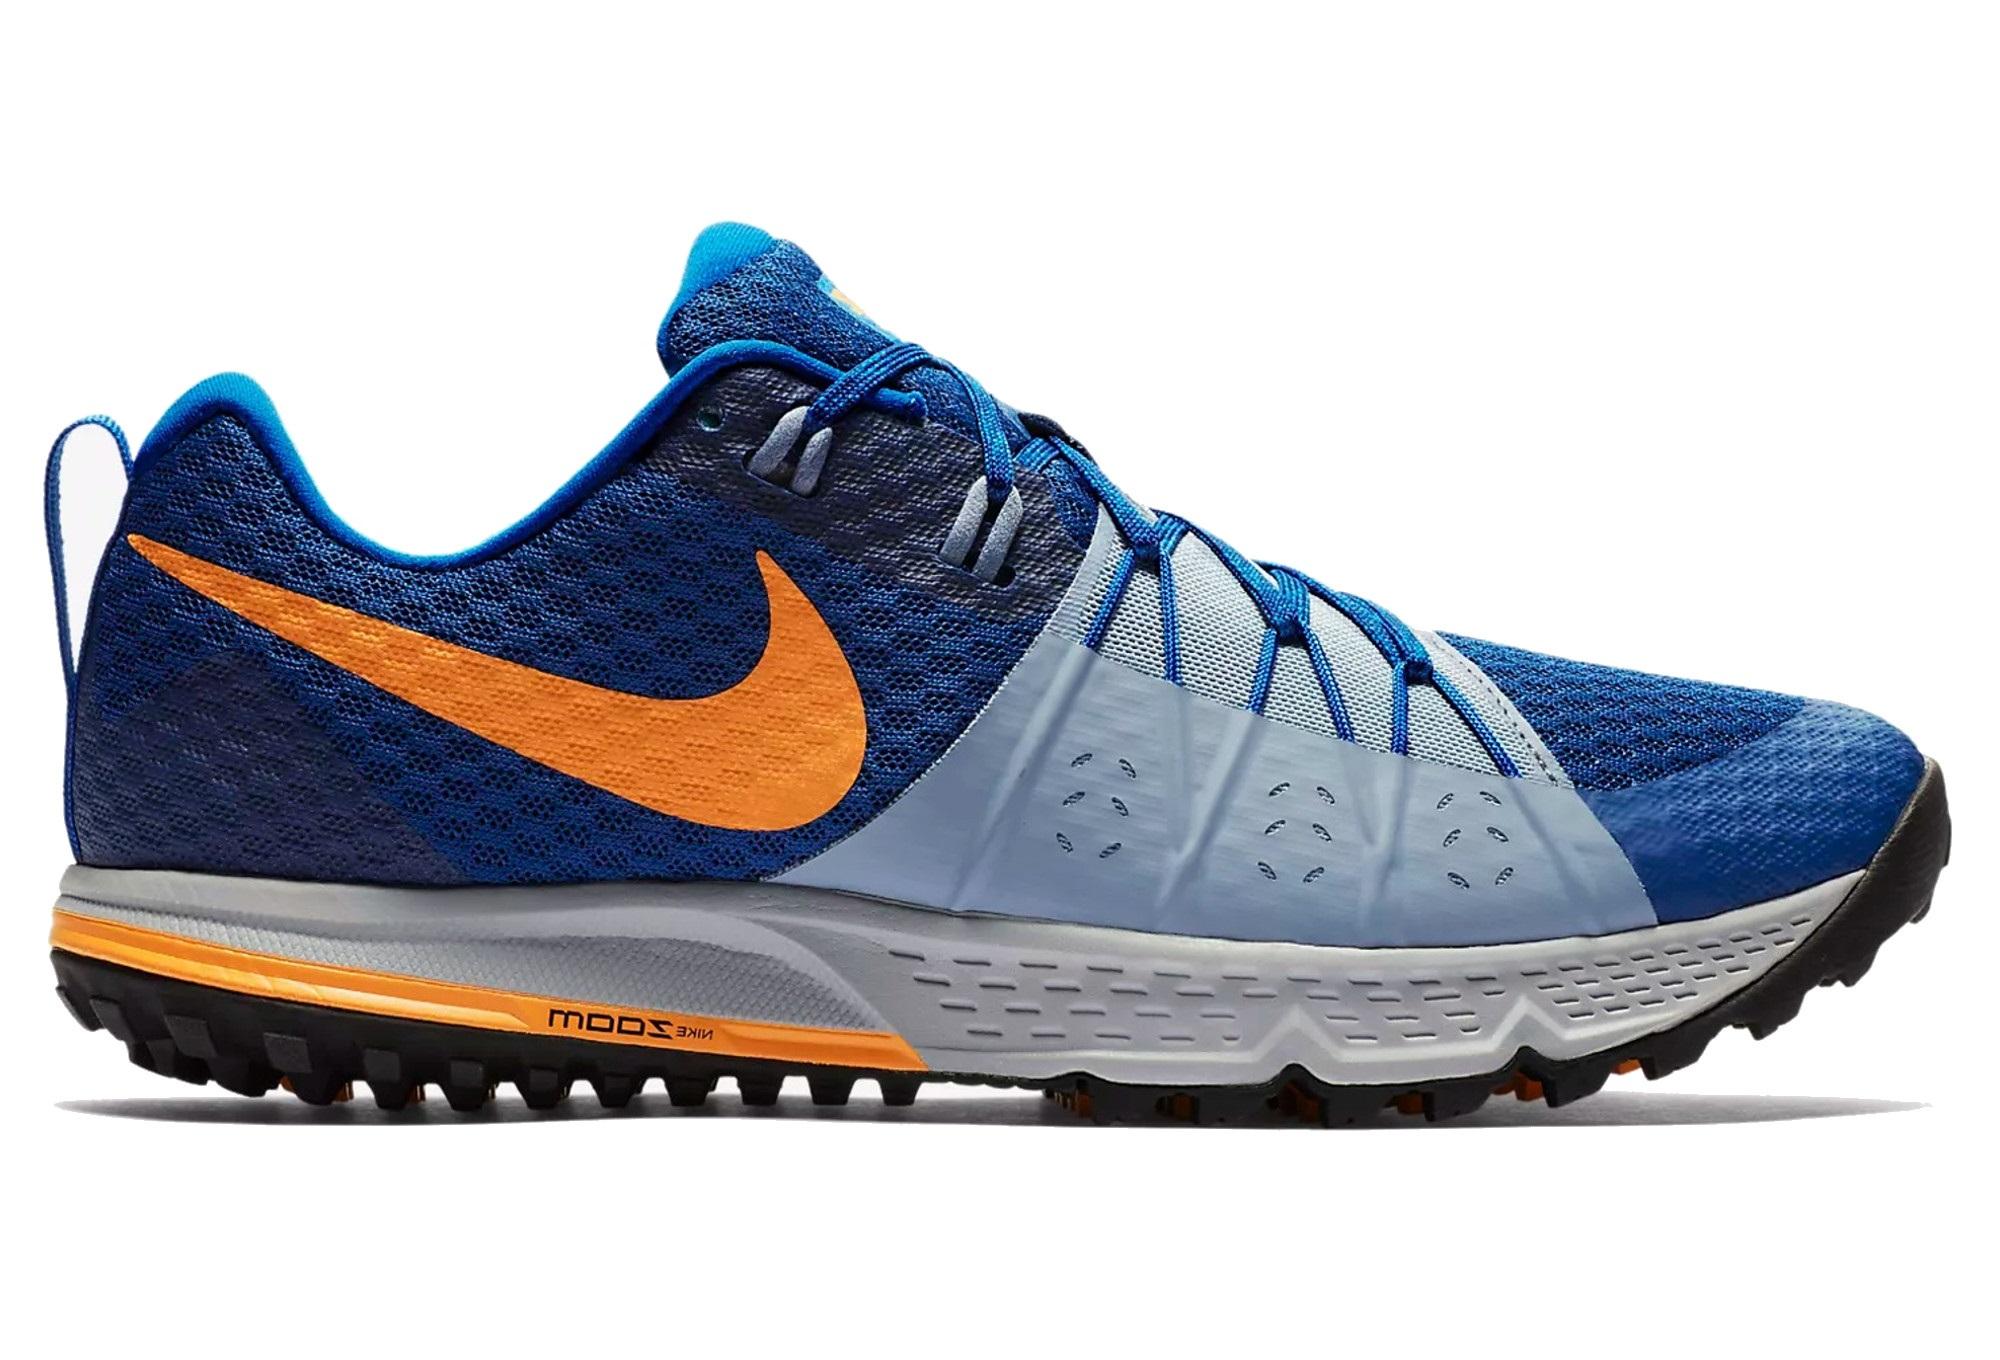 424b71143b8 Nike Shoes Air Zoom Wildhorse 4 Blue Orange Men